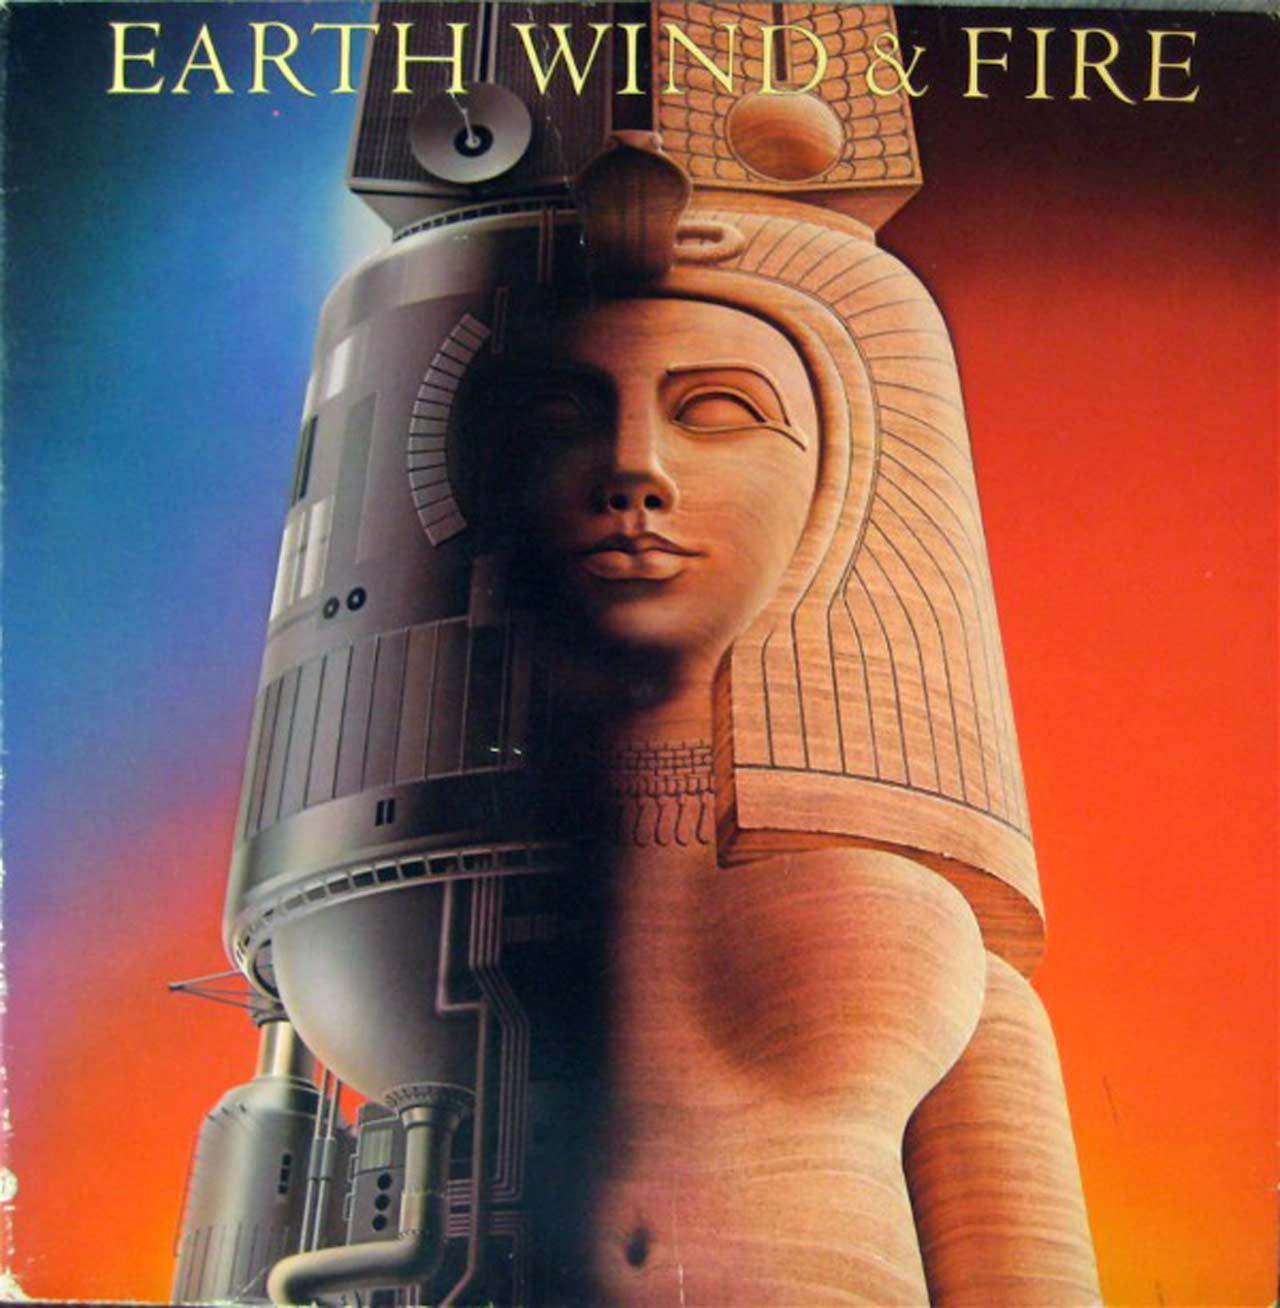 Sushei Nagaoka / Illustration Maestro - Earth Wind Fire